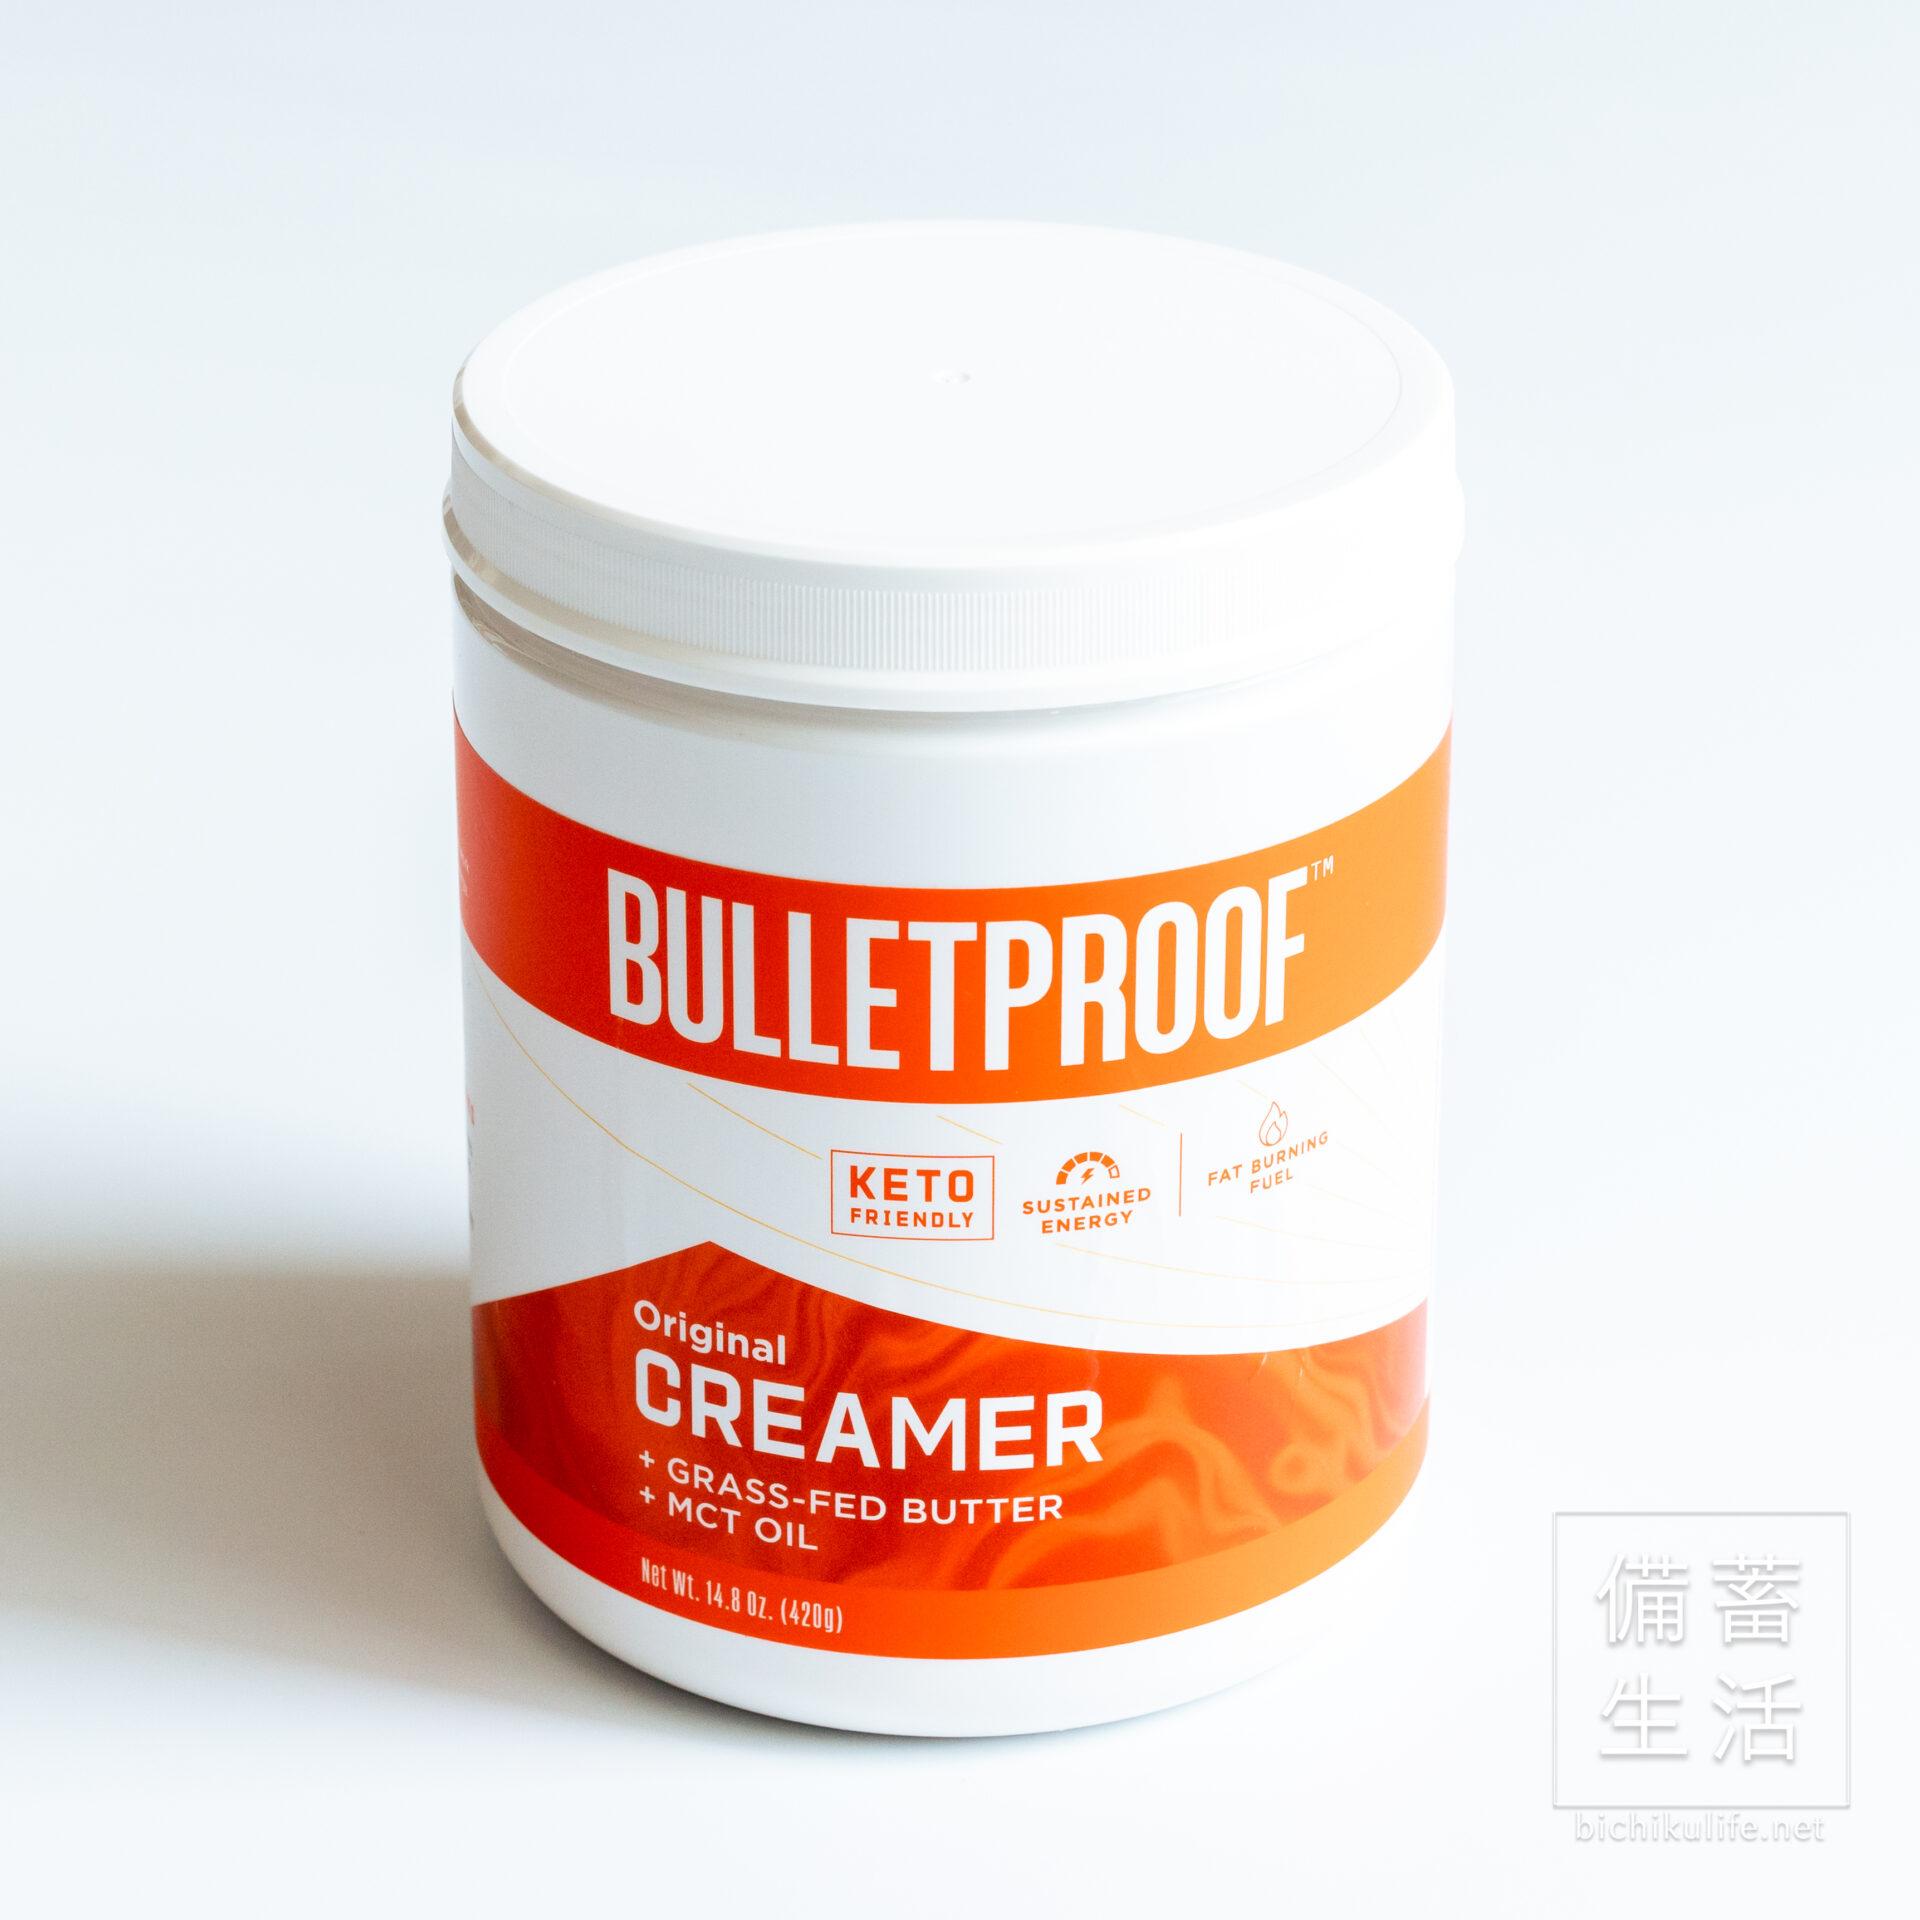 Bulletproof オリジナルクリーマー(グラスフェッドバター+C8&C10 MCTオイル)